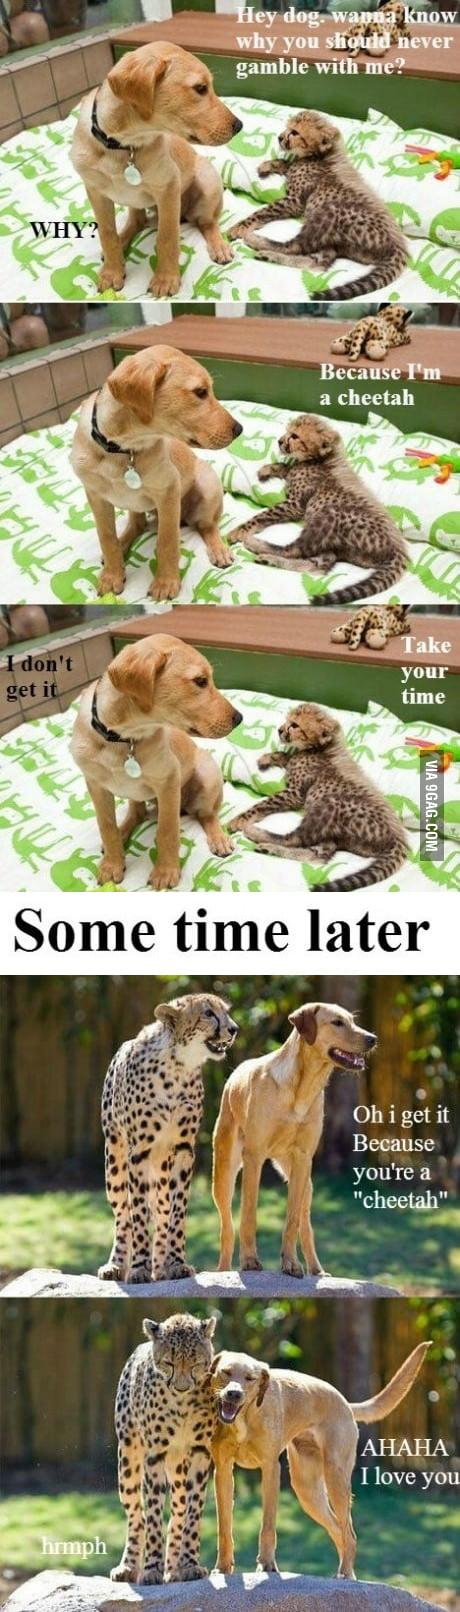 Slow poke dog don't get it